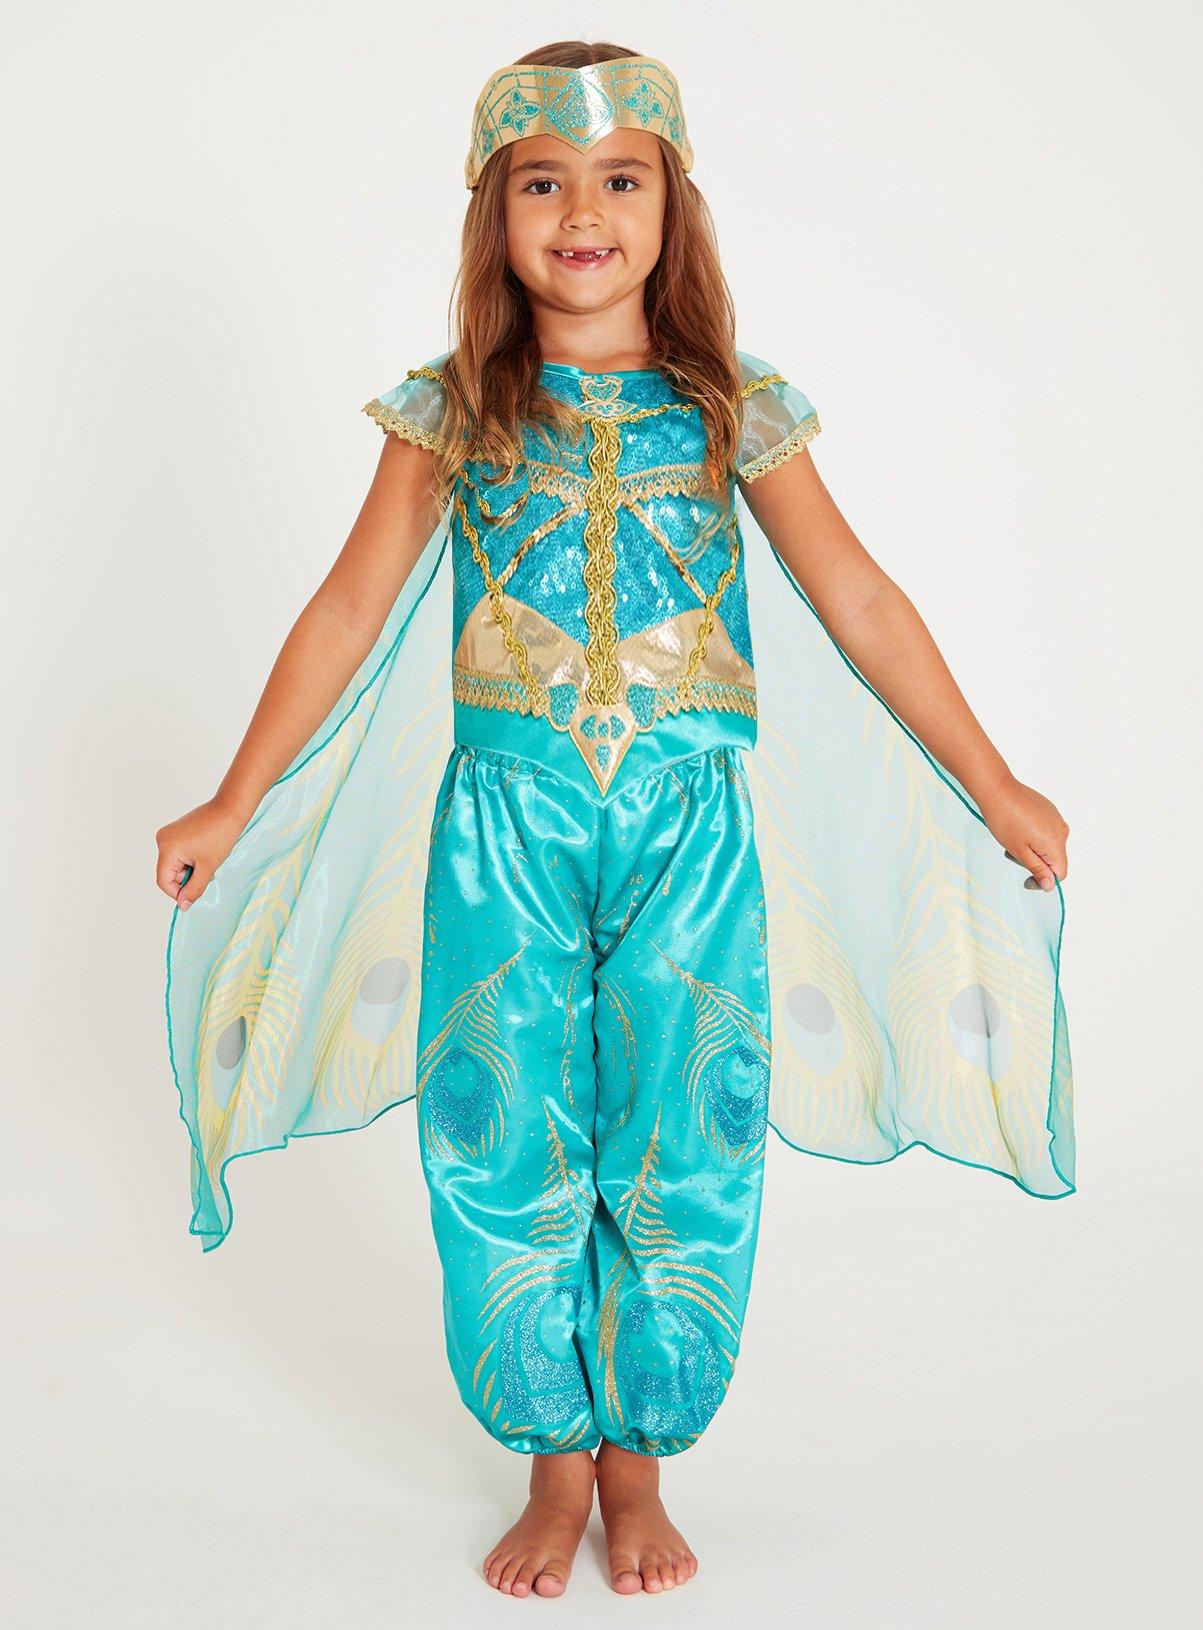 Kidsu0027 Fancy Dress Costumes   Disney Costumes   Argos